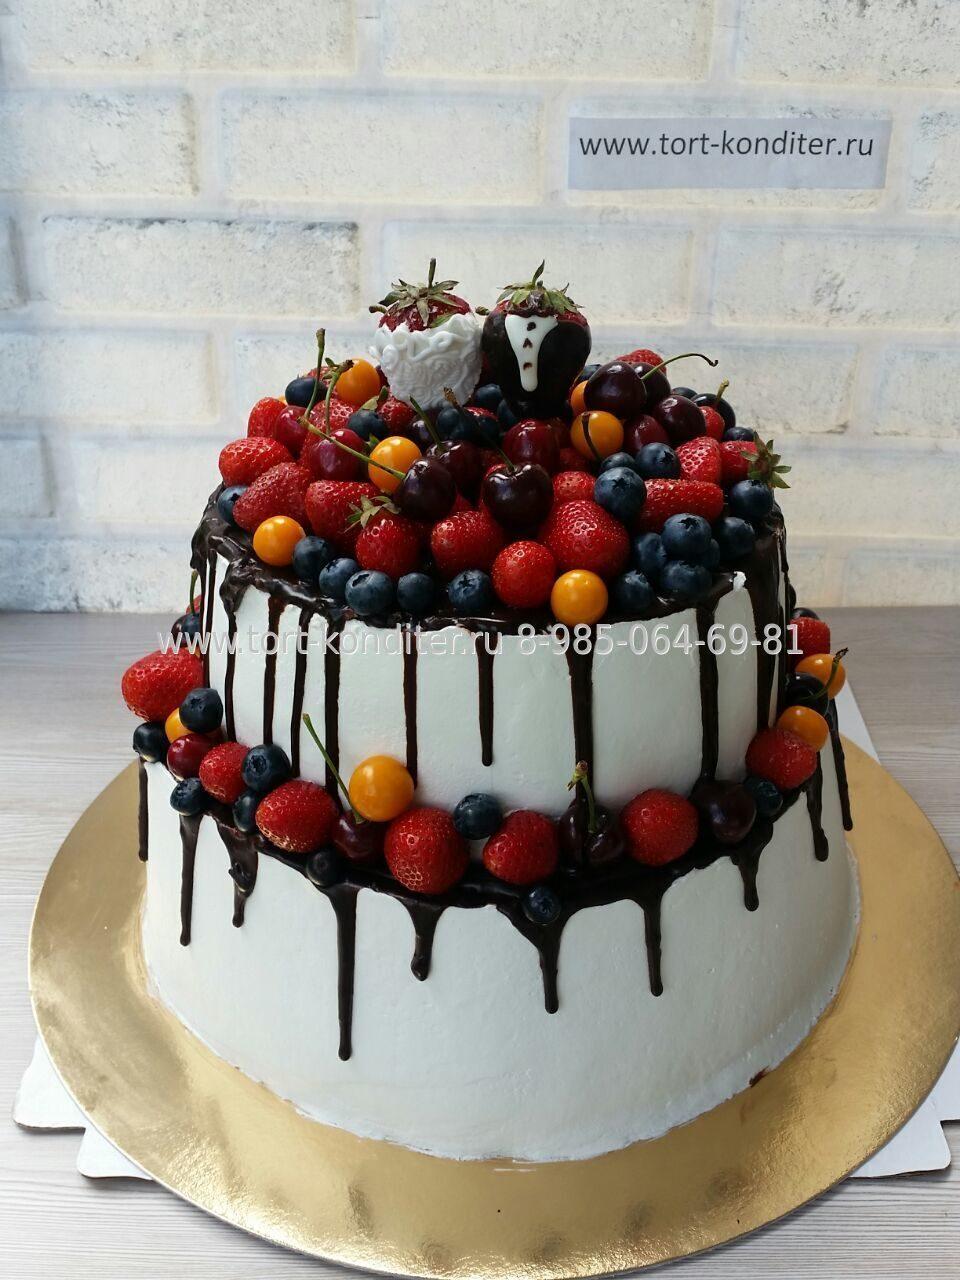 Двухъярусный торт без мастики рецепт